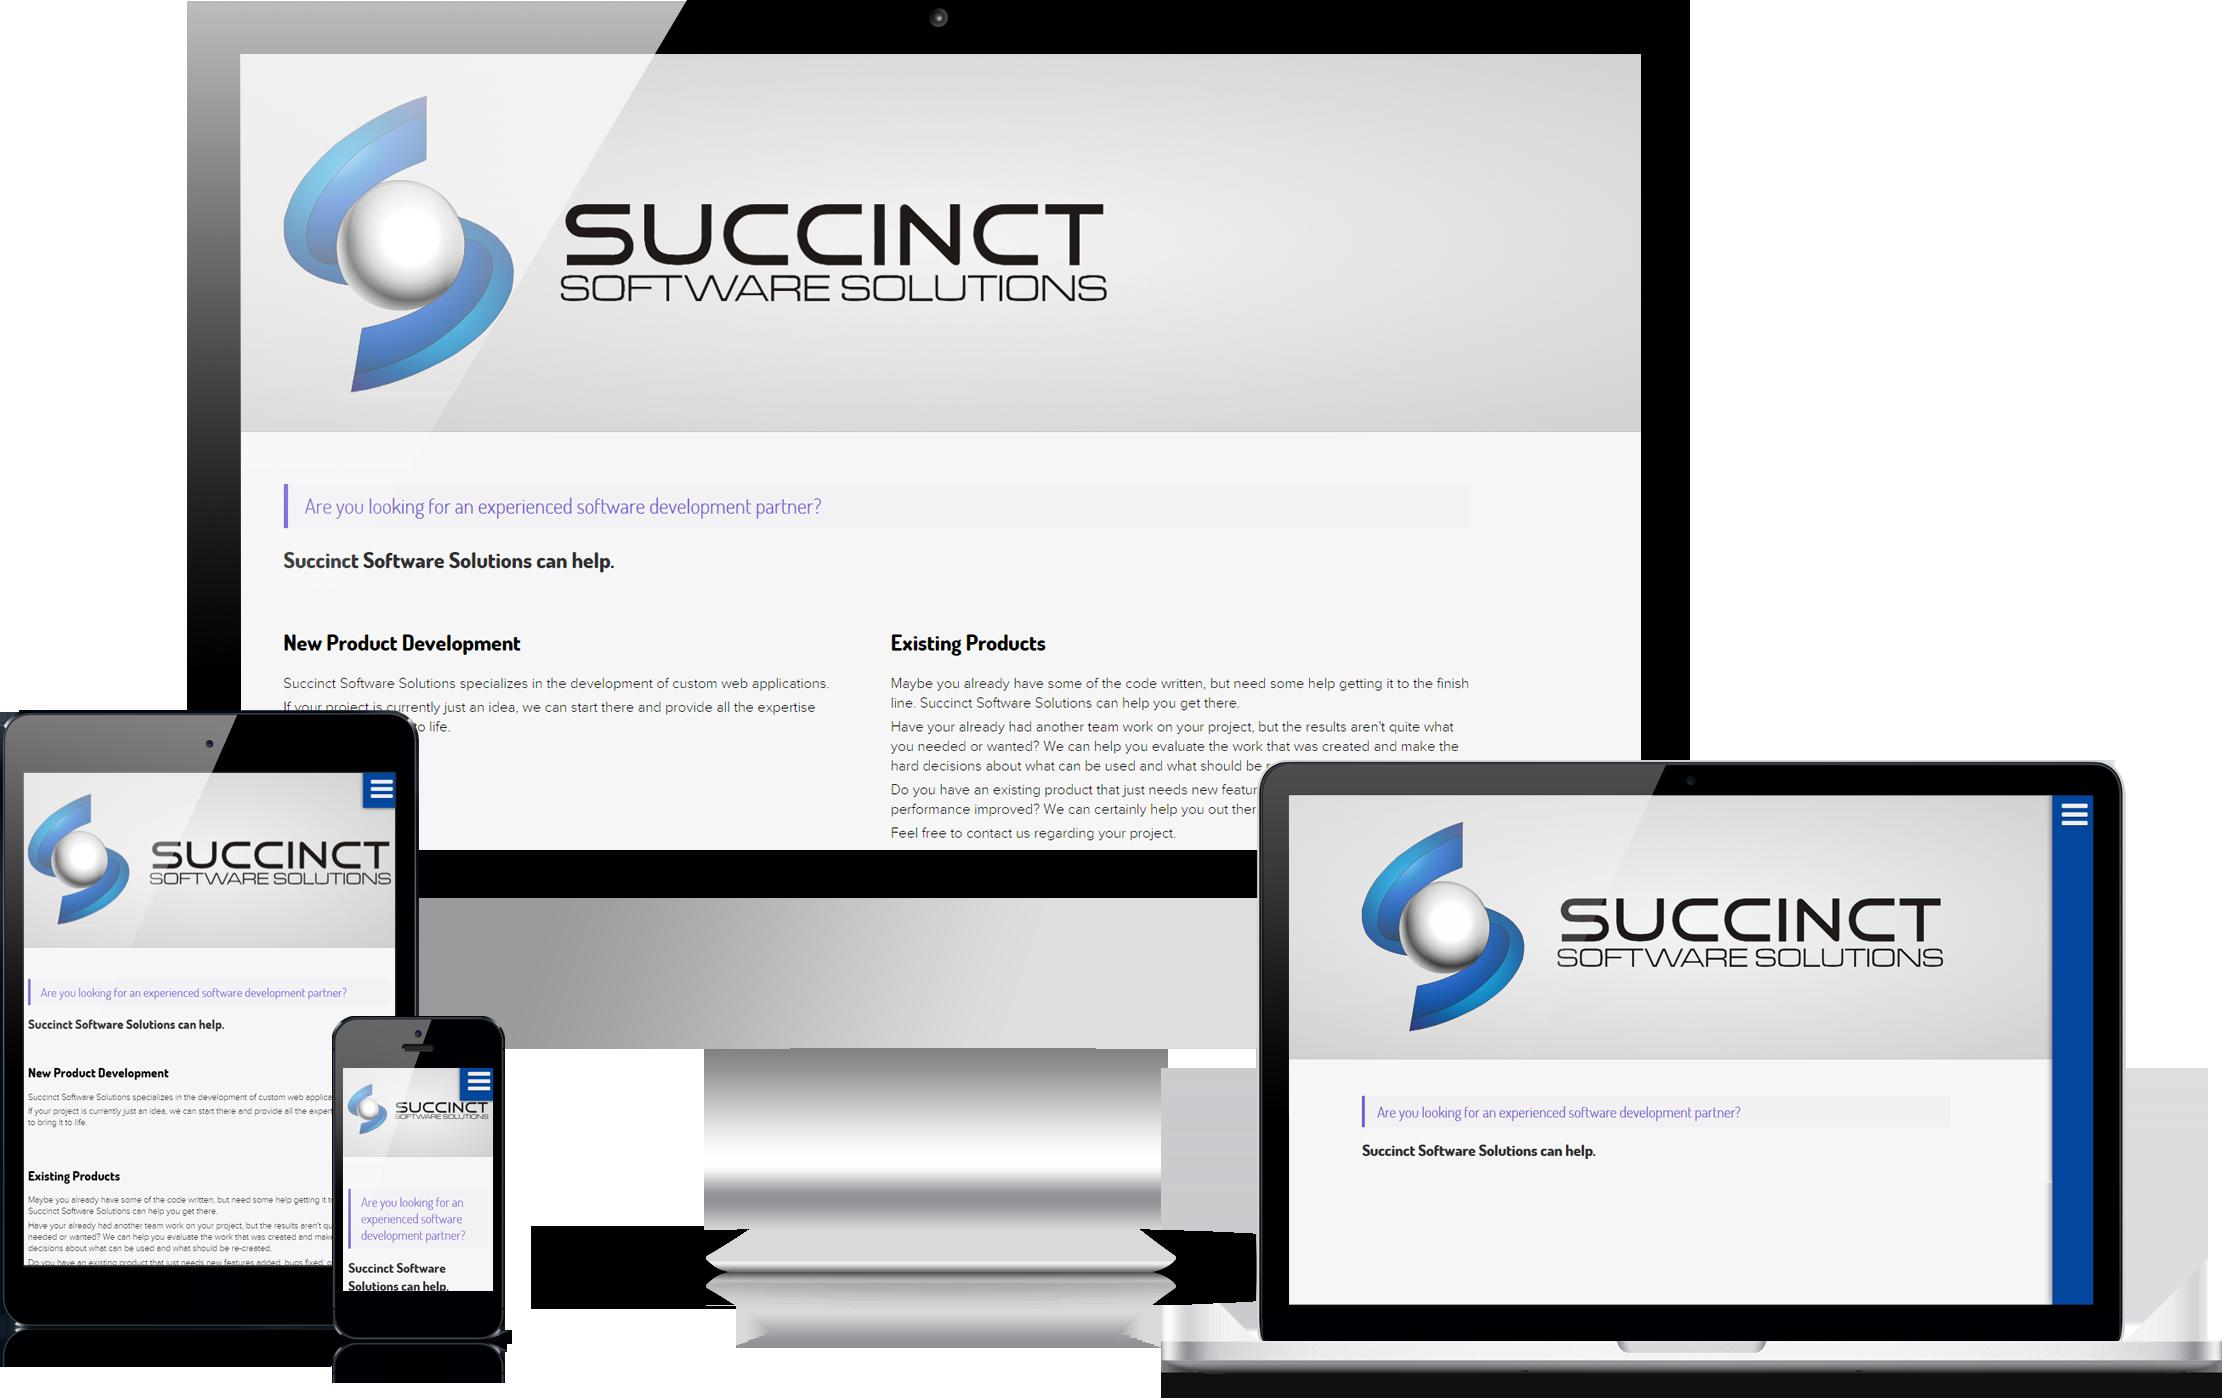 Succinct Software